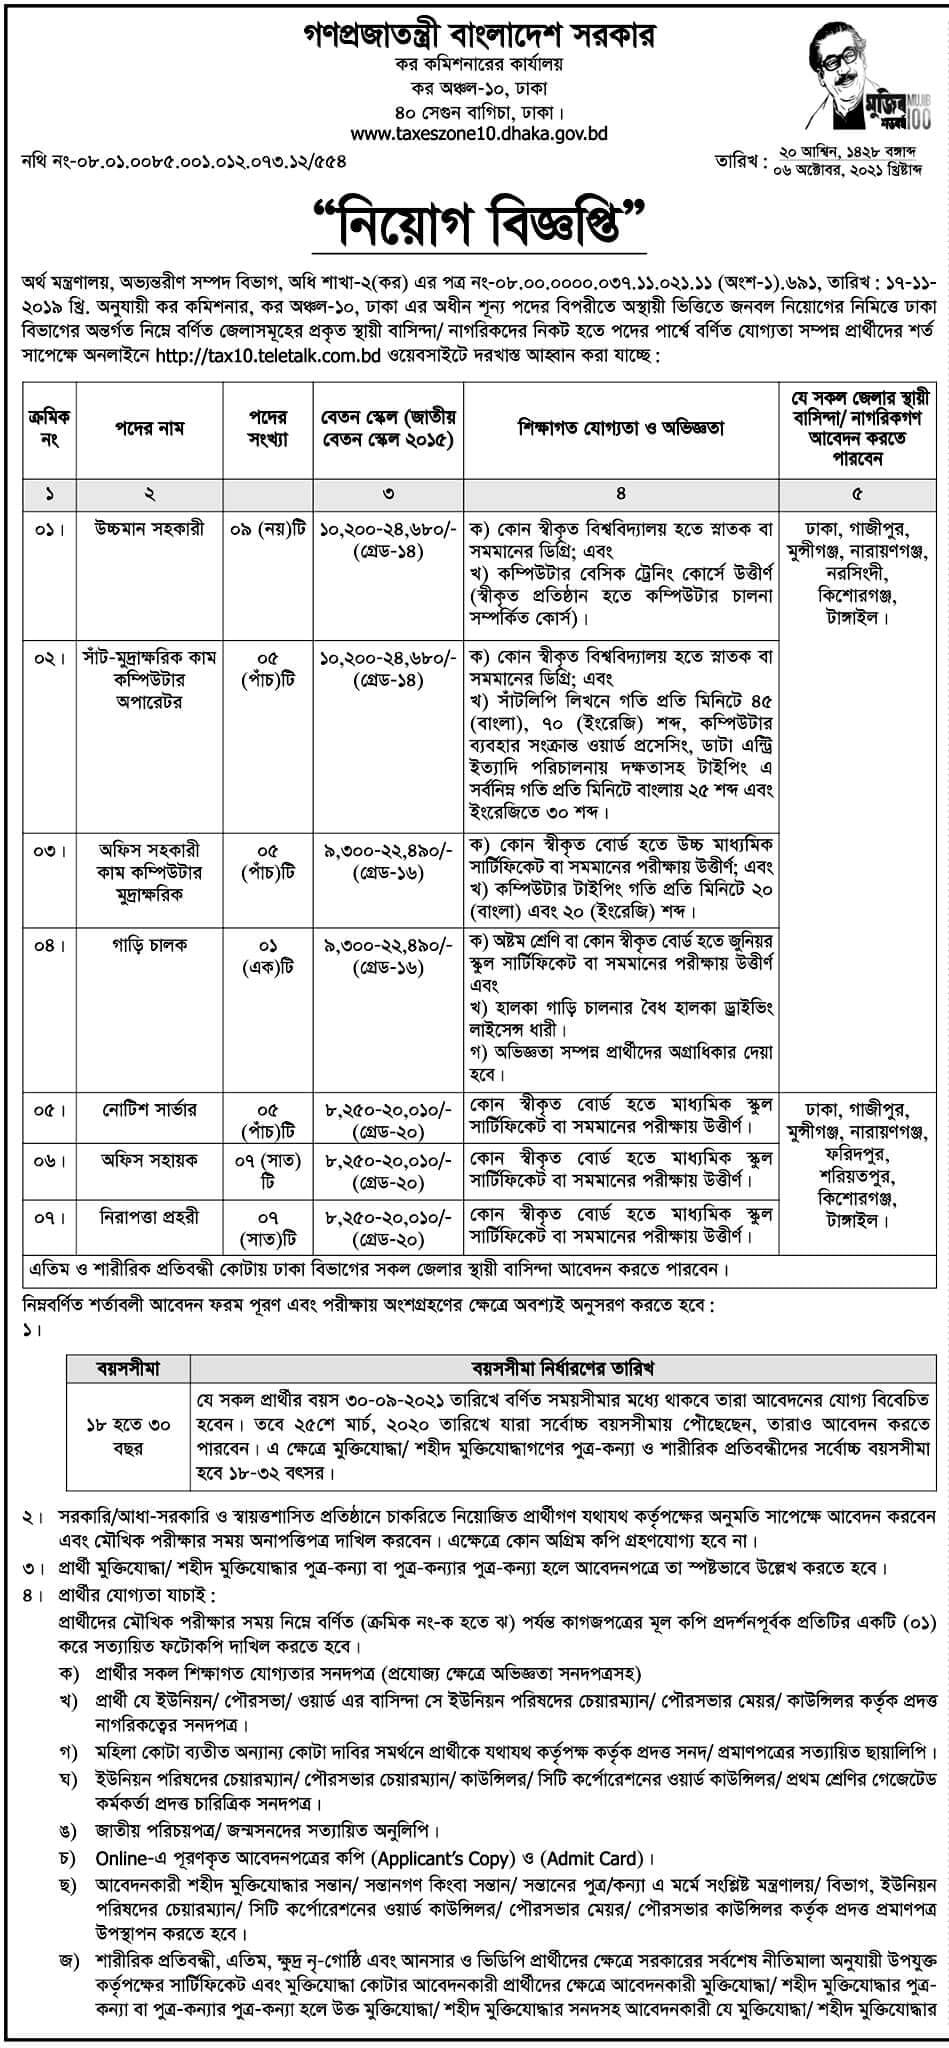 Tax Commissioner office Job Circular image 2021